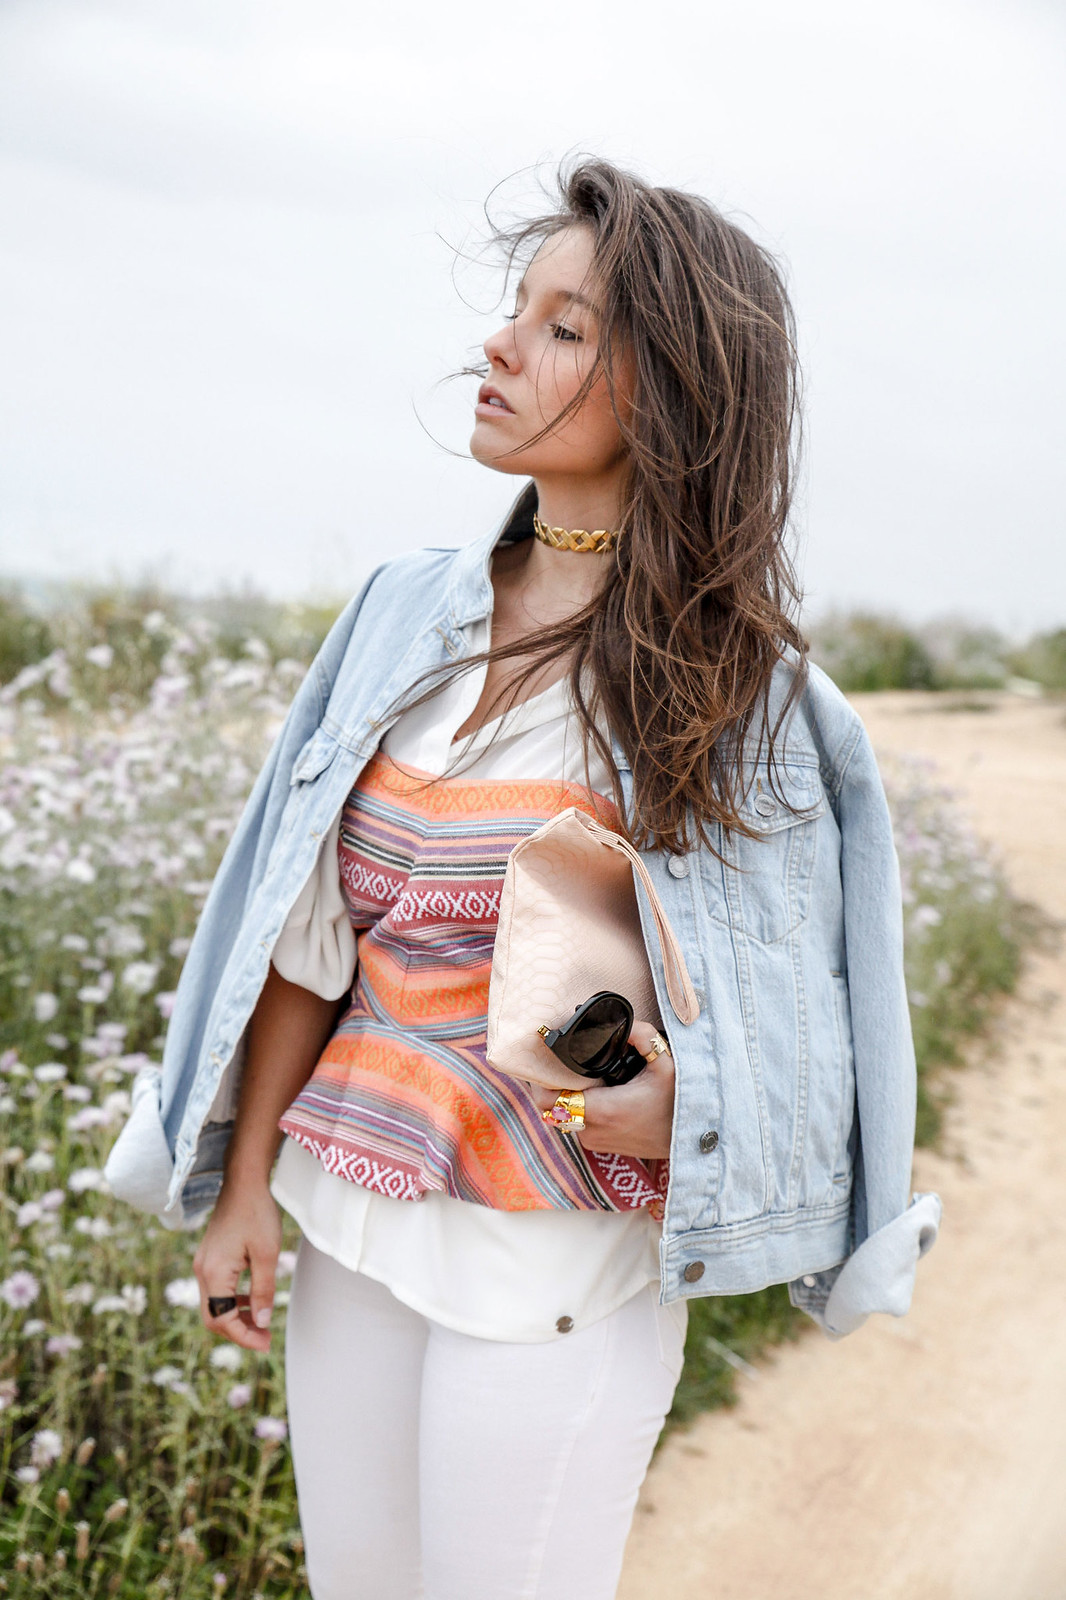 01_corset_etnico_danity_paris_theguestgirl_influencer_barcelona_laura_santolaria